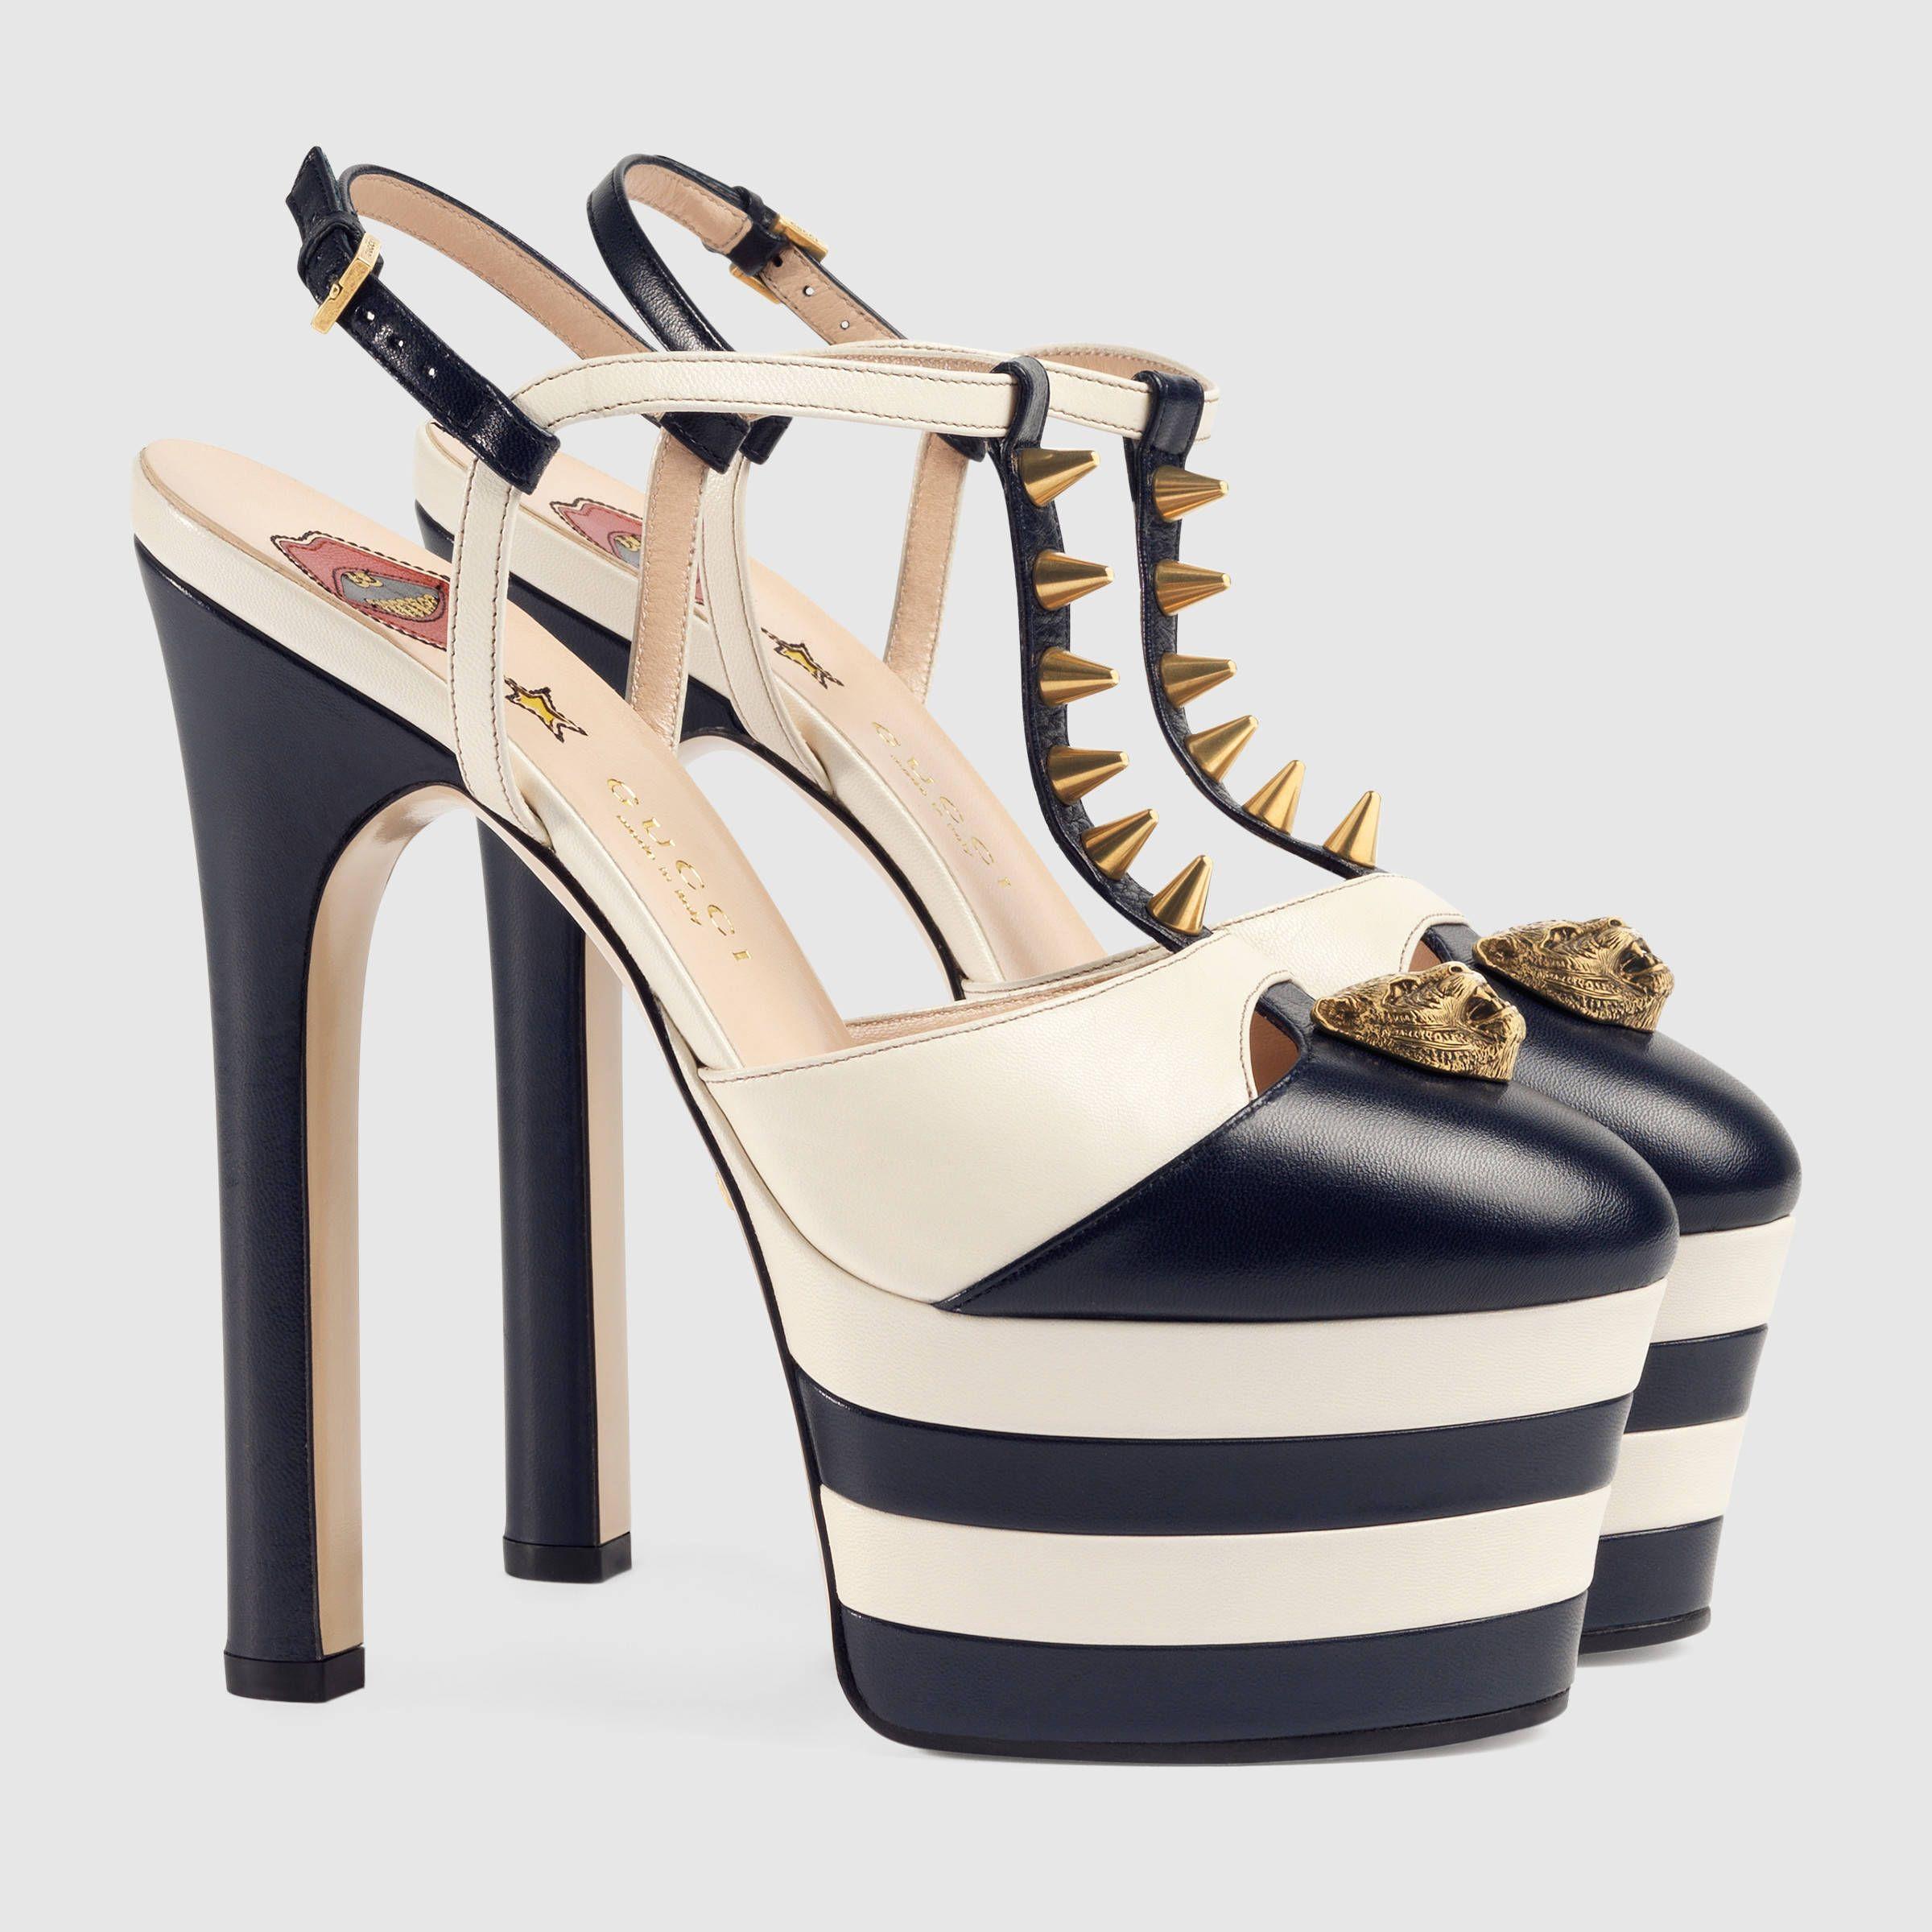 3e95cb66f Gucci Women - Studded leather platform pump - 421627C9D104071 ...